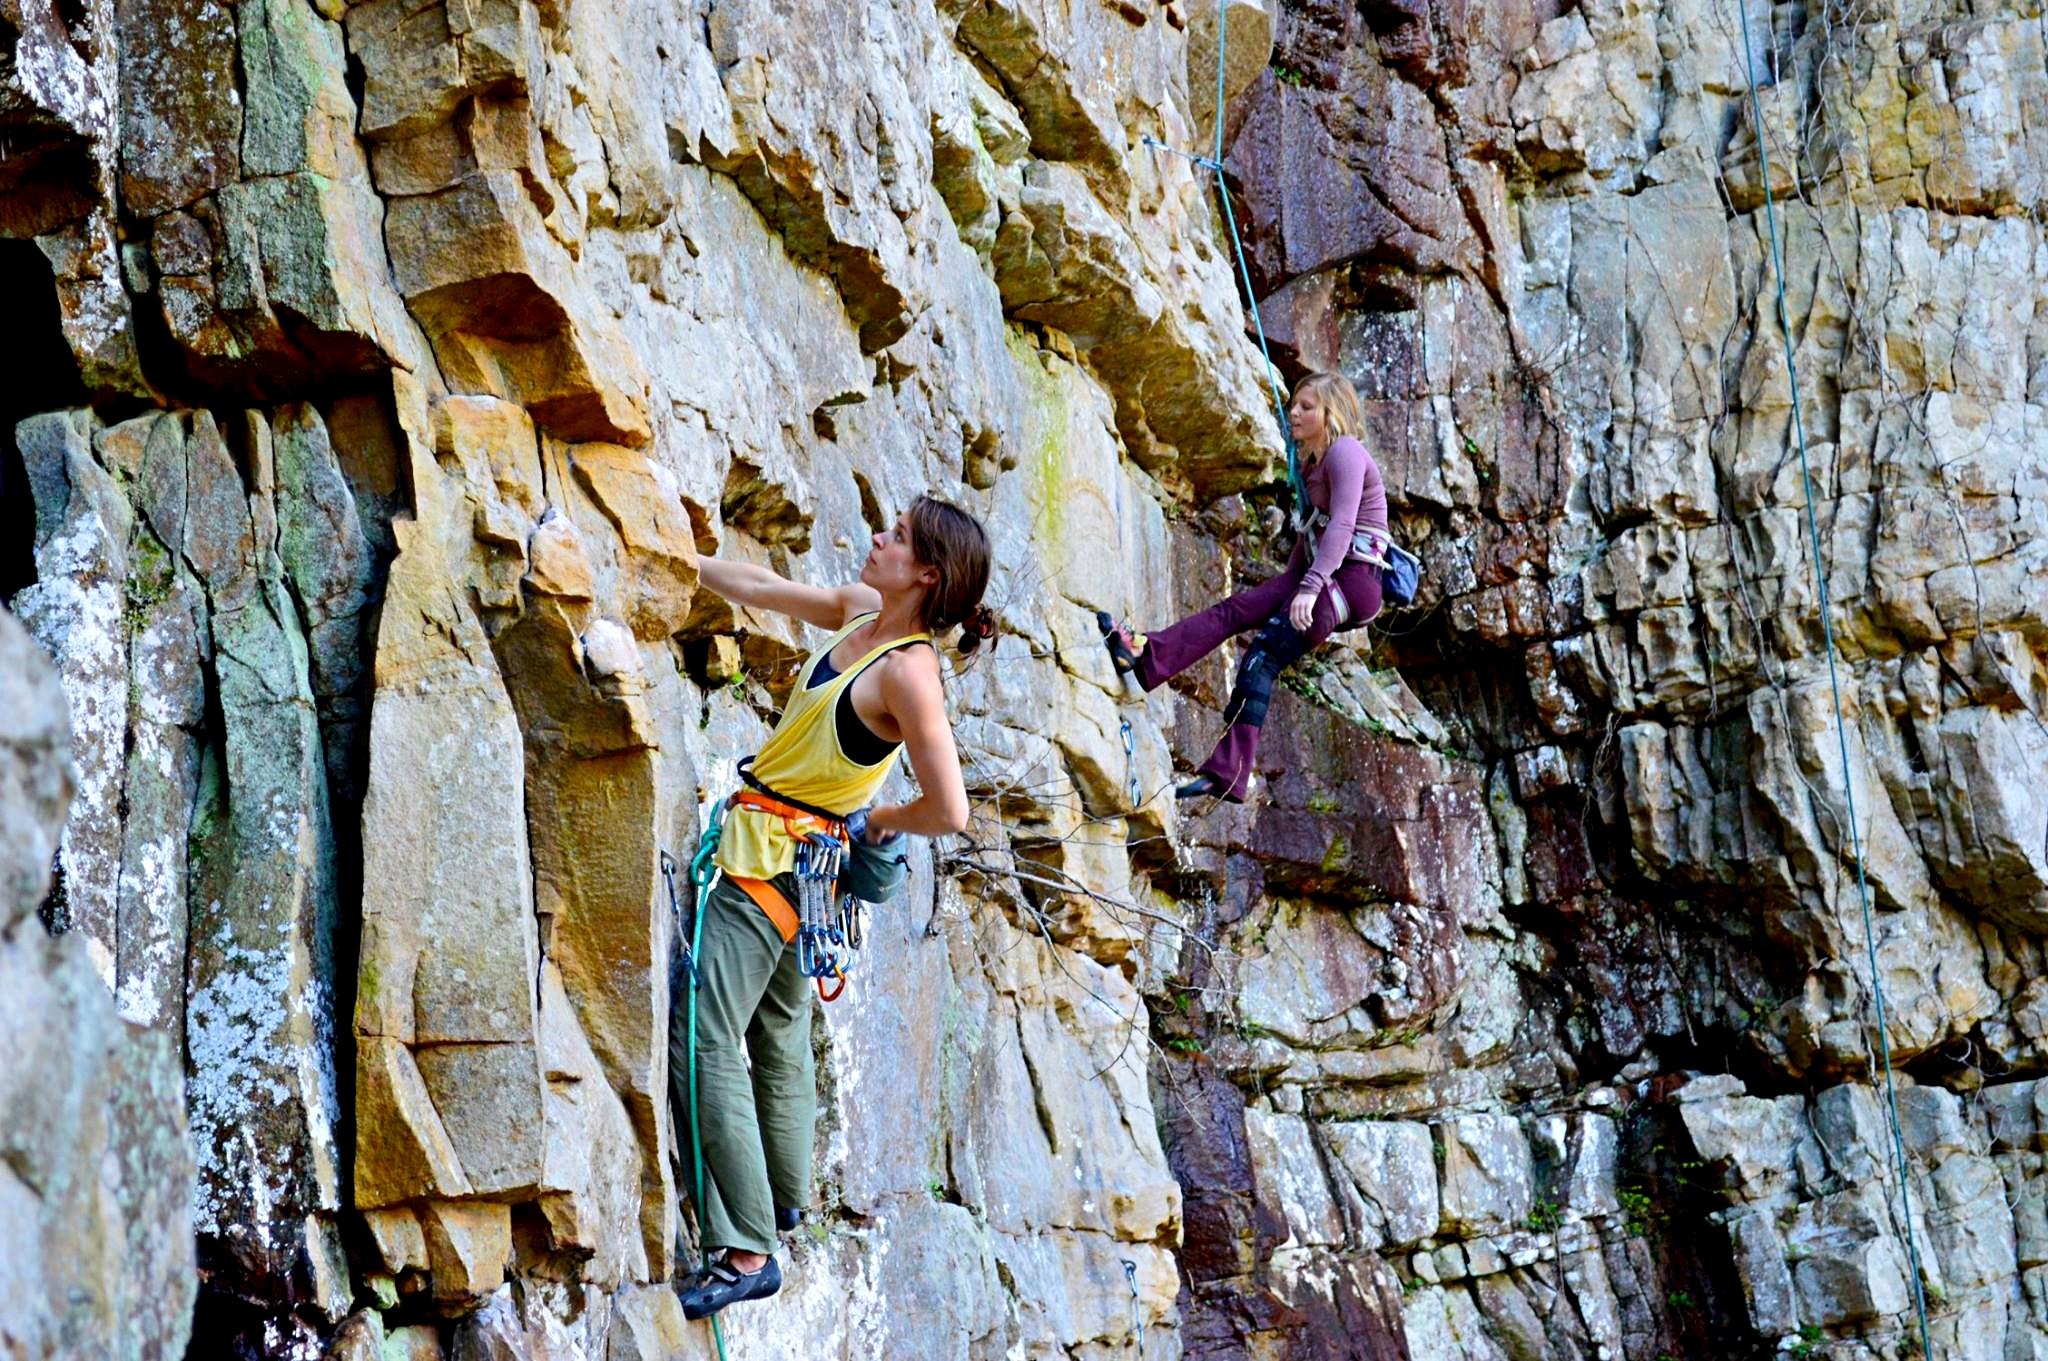 Climbers at Denny Cove. Photo: Southeastern Climbers Coalition